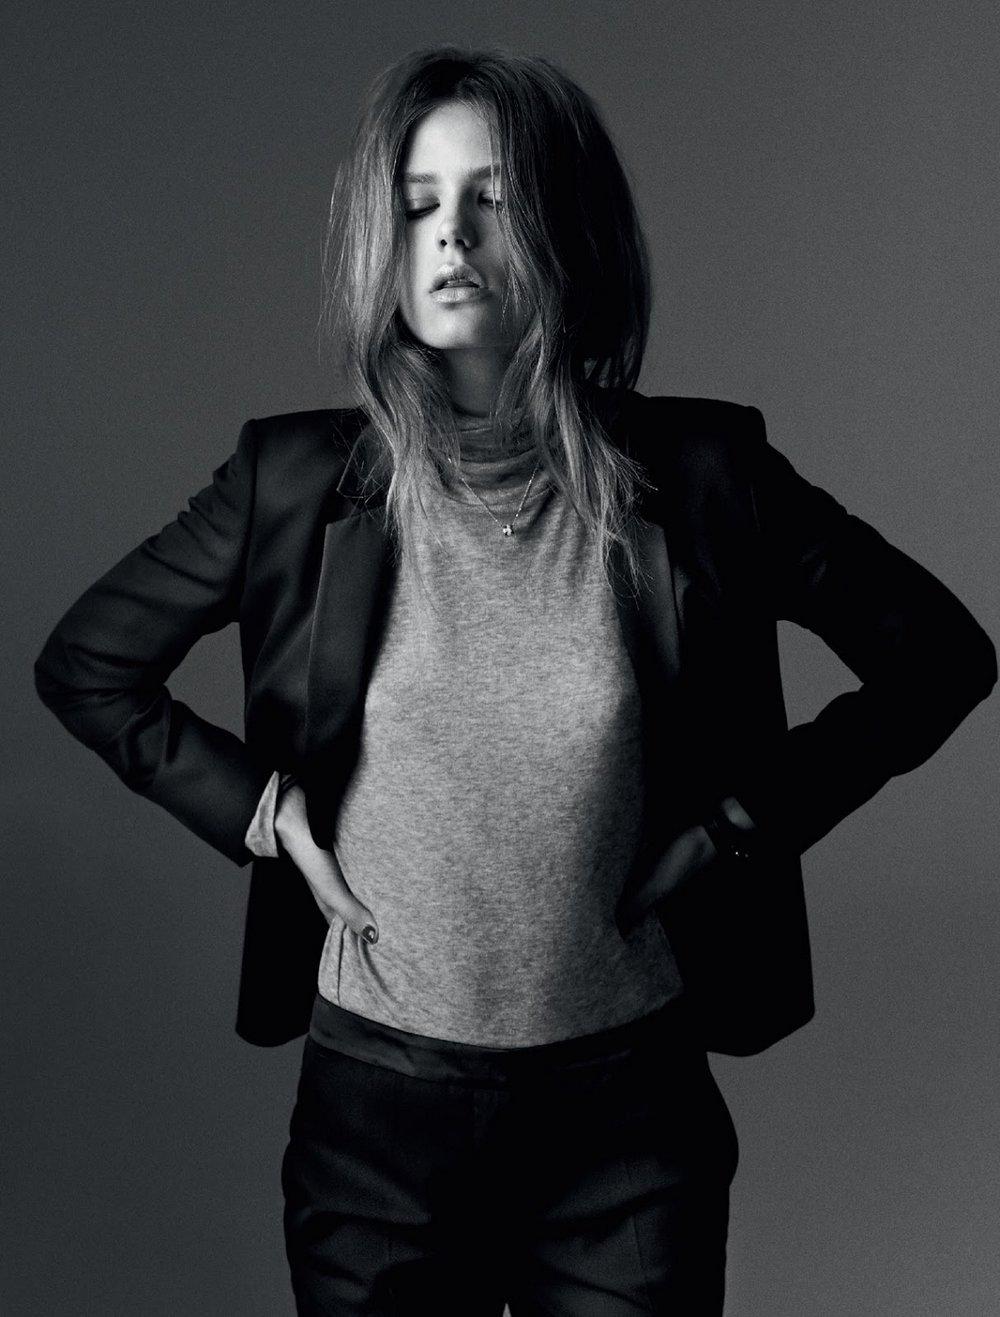 Caroline-Brasch-Nielsen-By-Henrik-Bülow-For-Eurowoman-November-2014-5